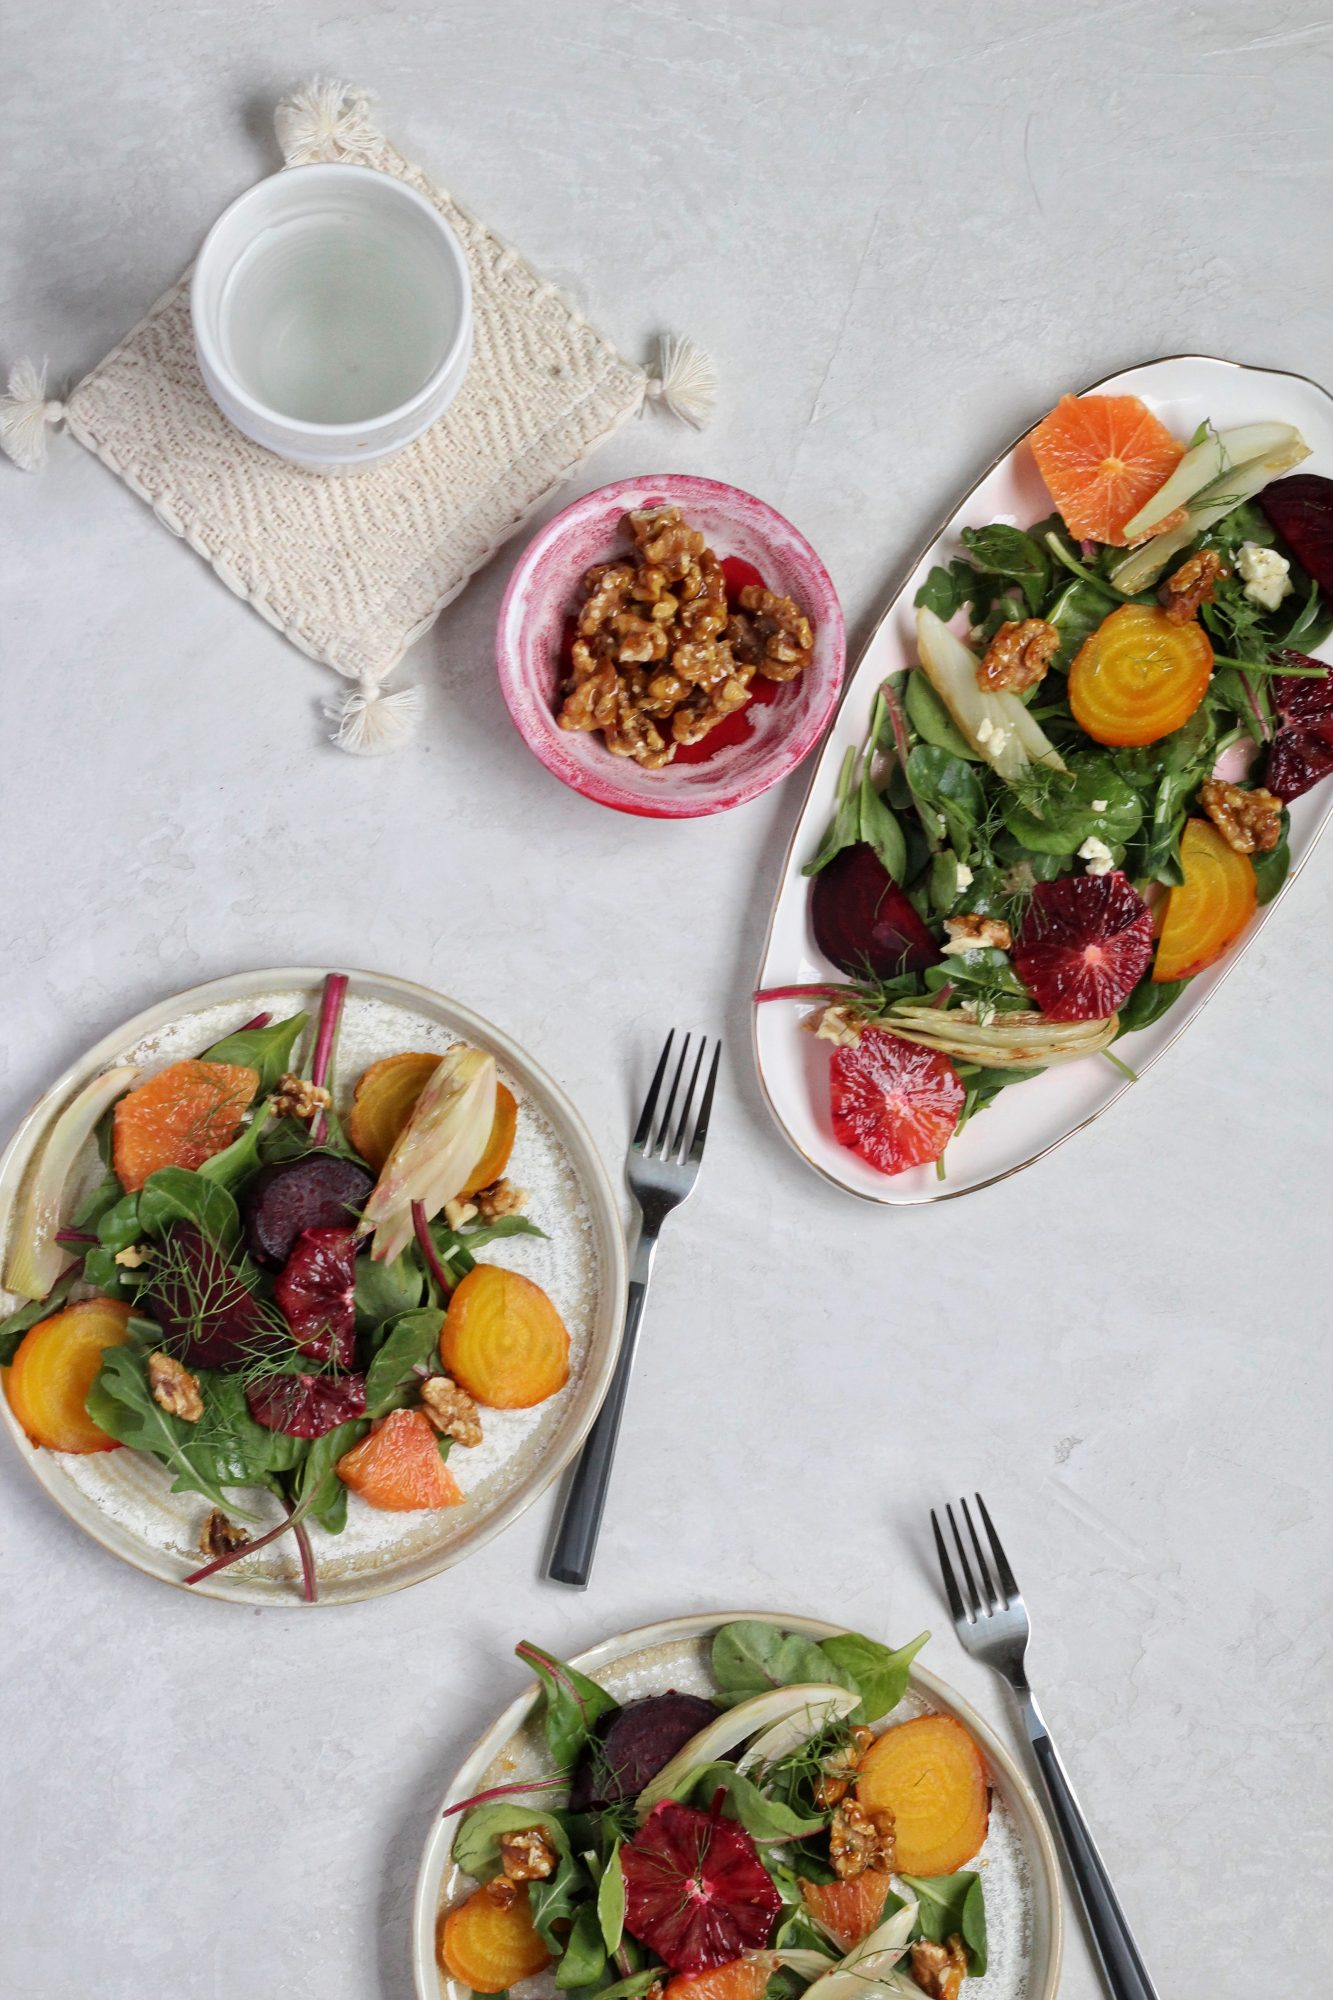 Beet Salad with Roasted Fennel, Blood Orange and Gorgonzola Vinaigrette